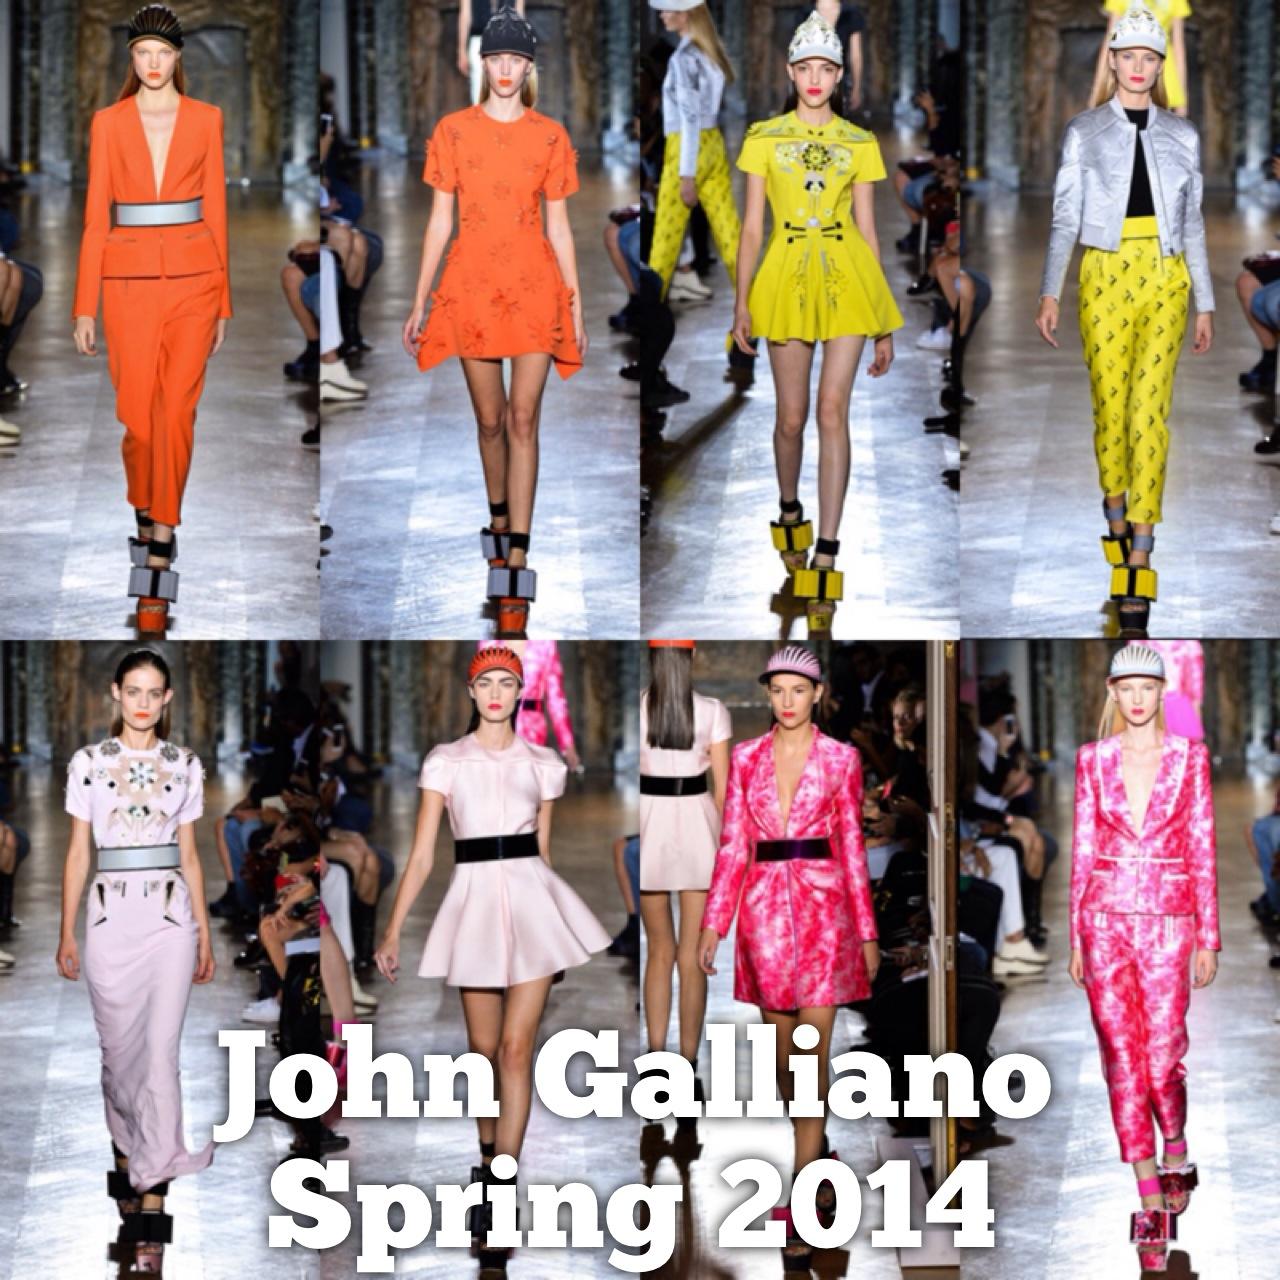 Spring 2014 John Galliano